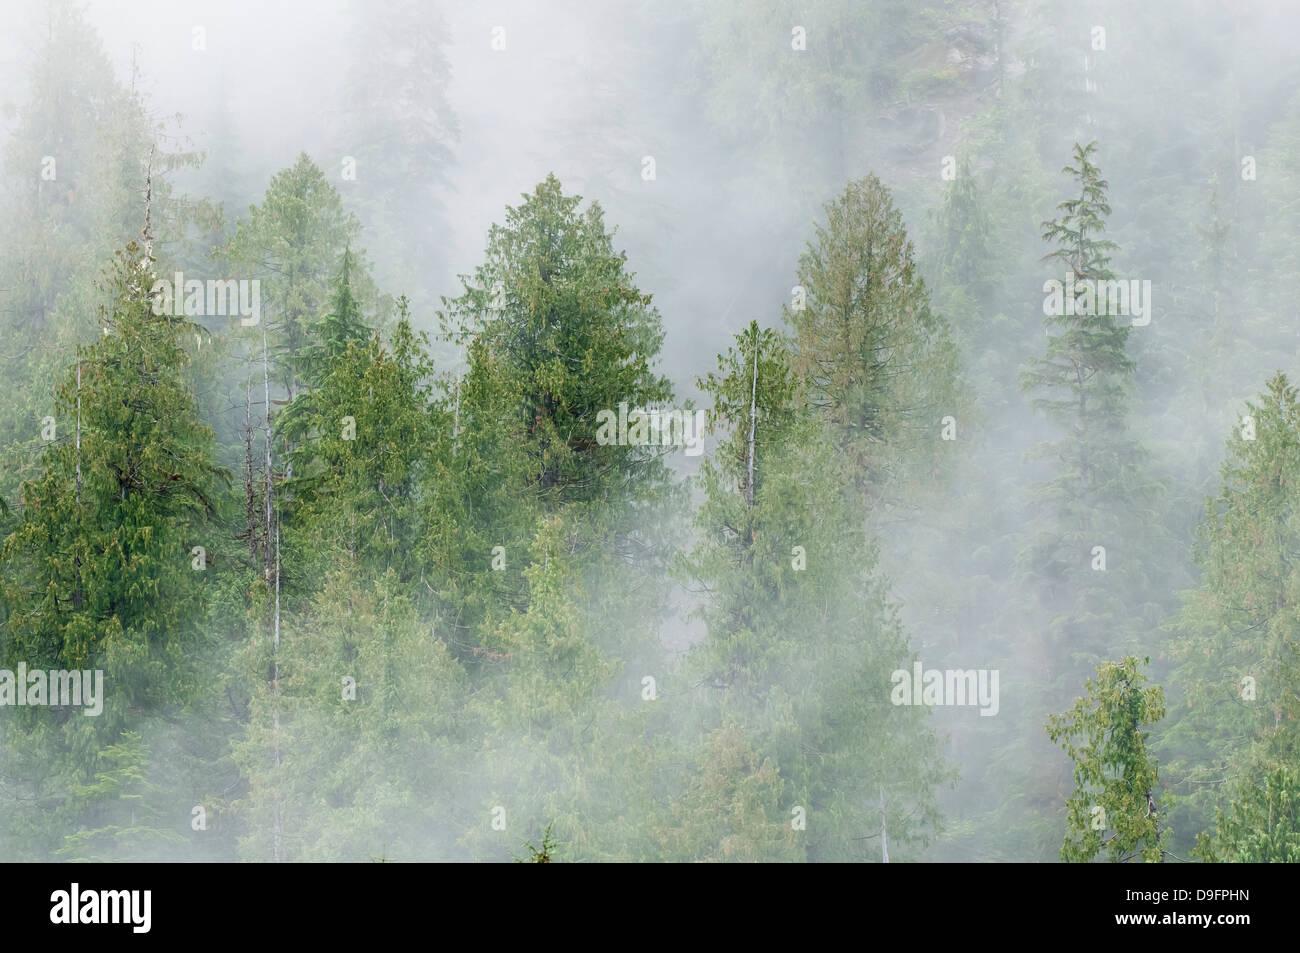 Nebel bedeckte Kiefern im Great Bear Rainforest, British Columbia, Kanada Stockbild